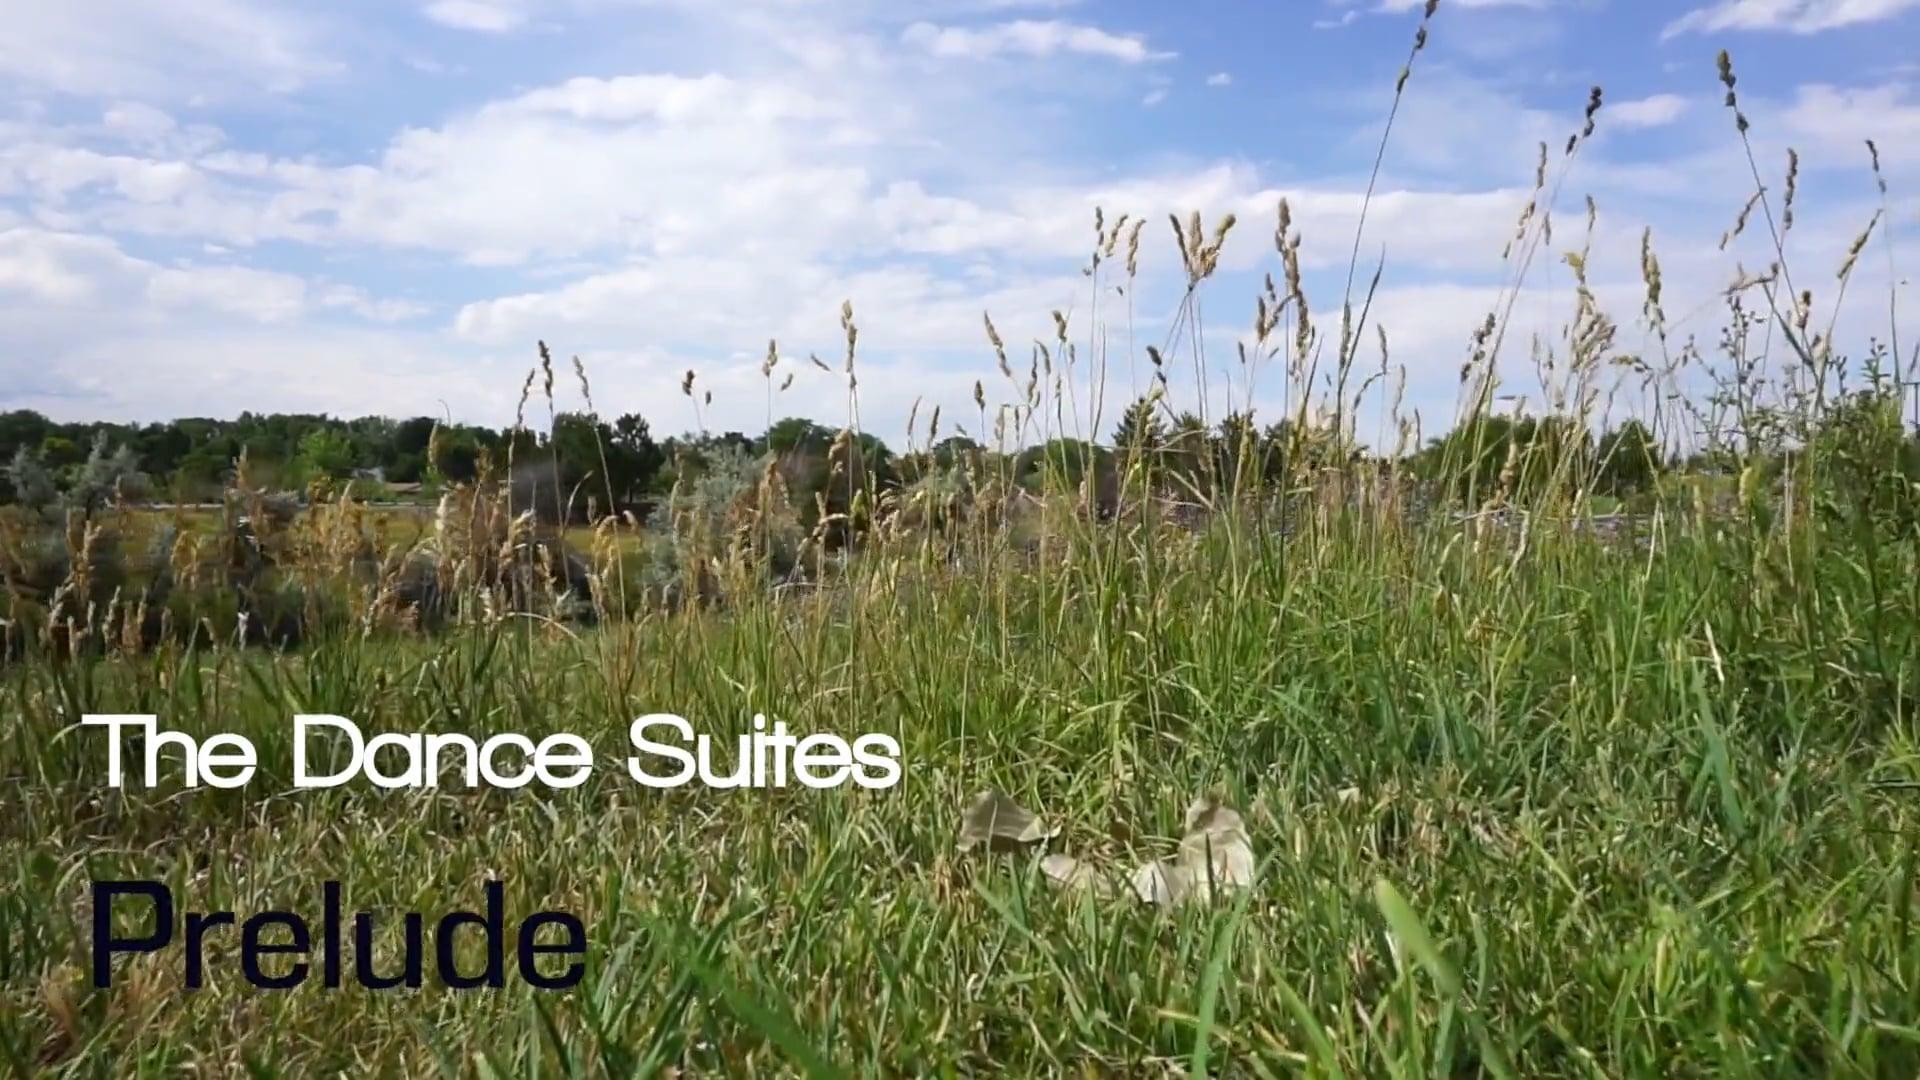 The Dance Suites